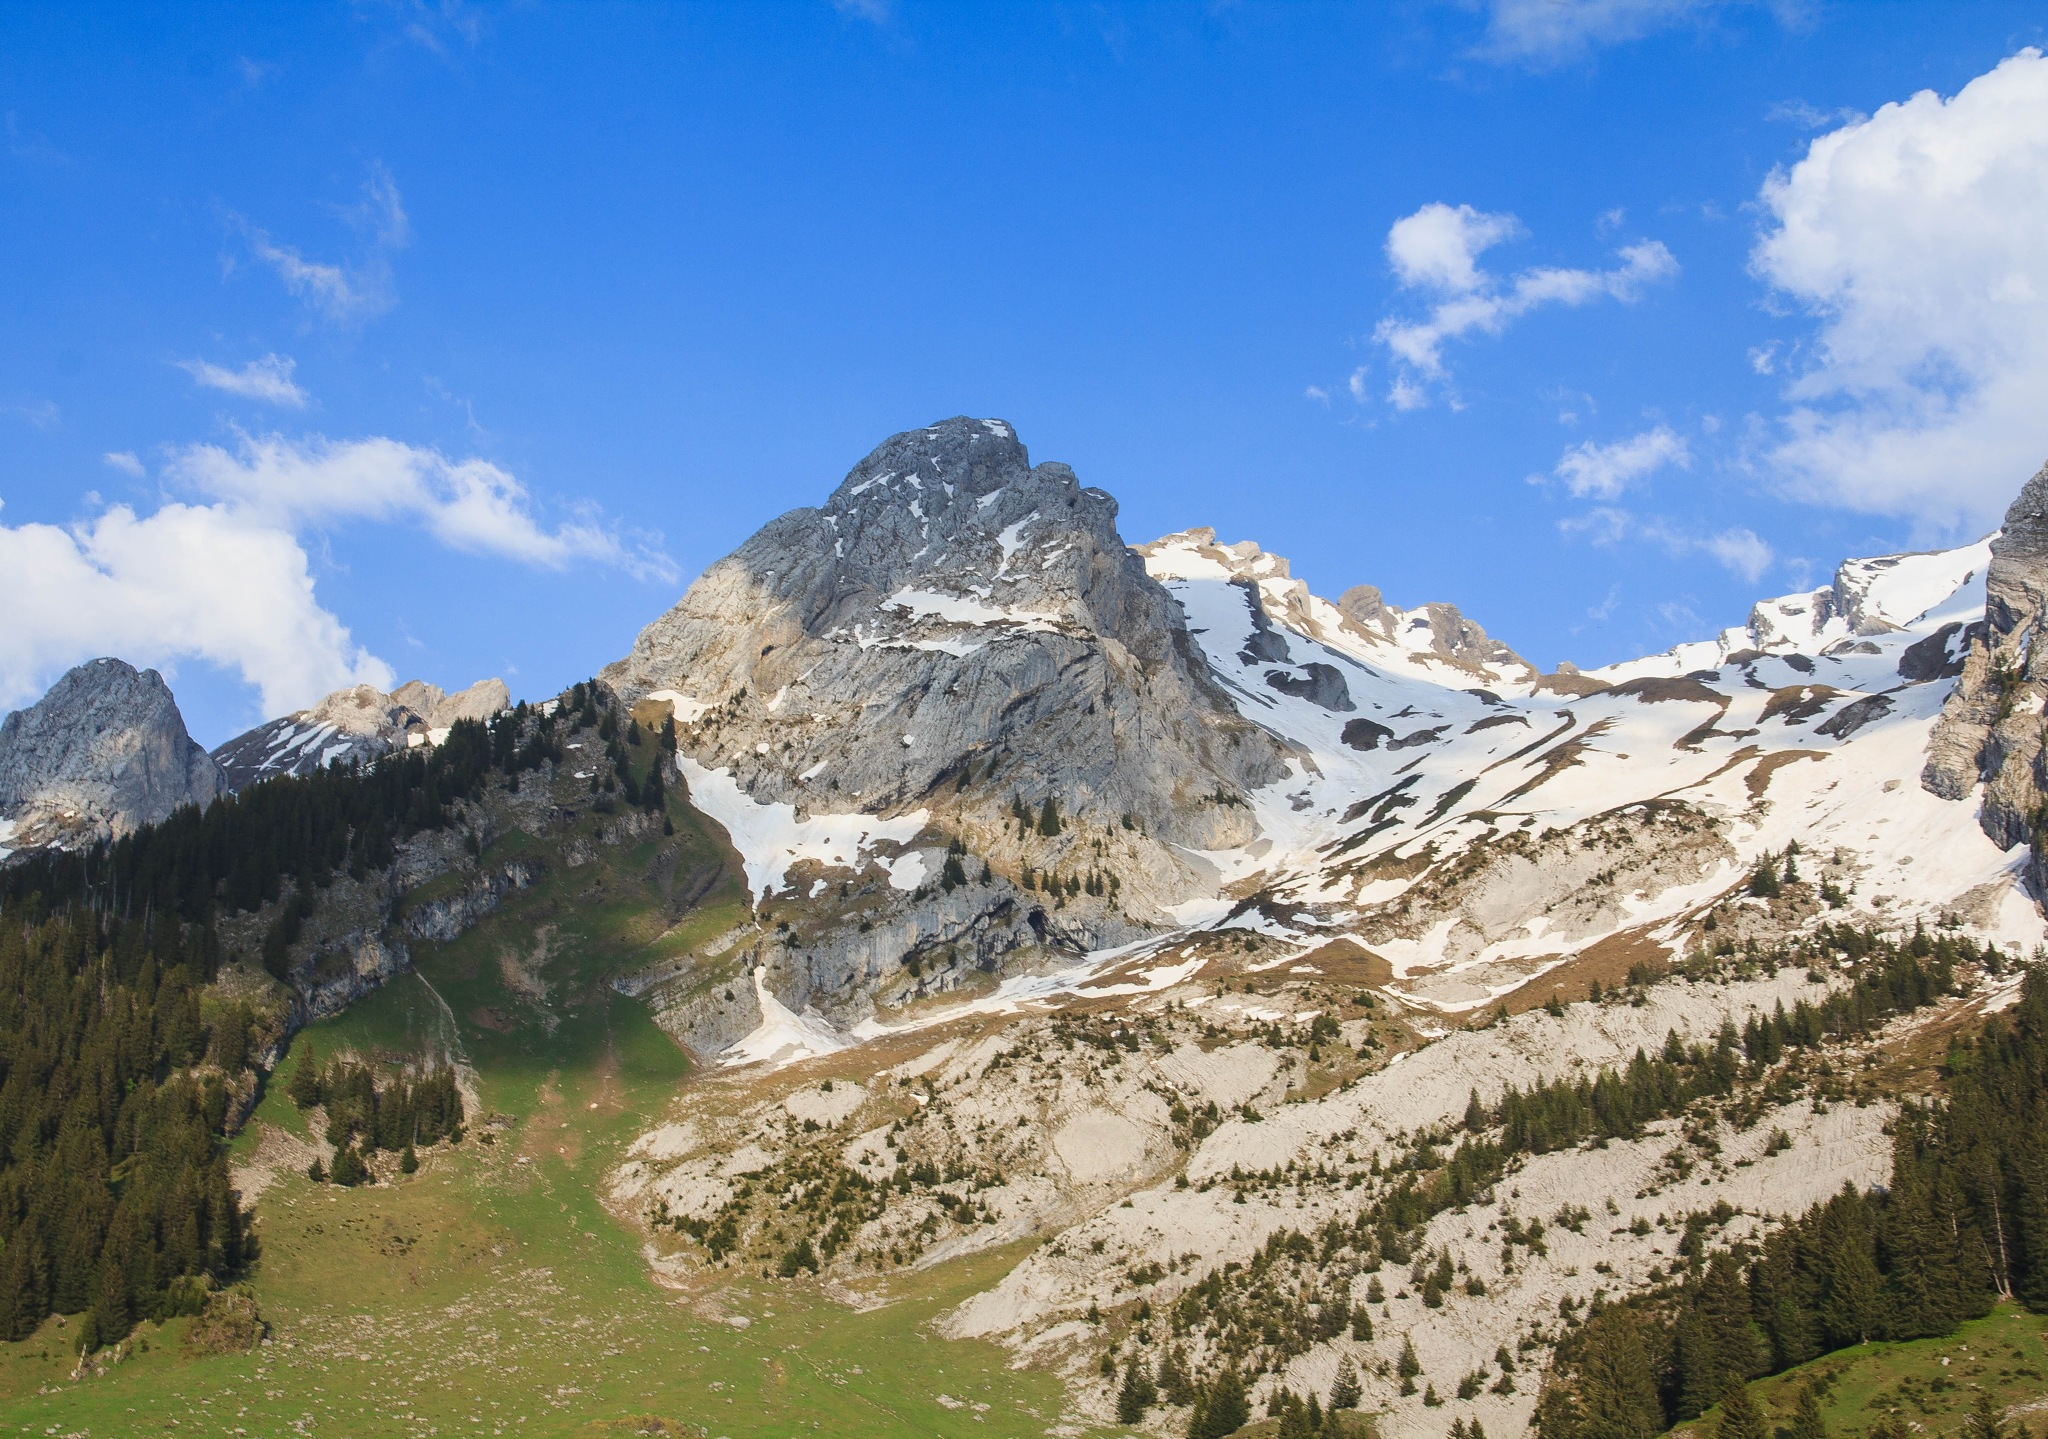 Mountains by David Cantos